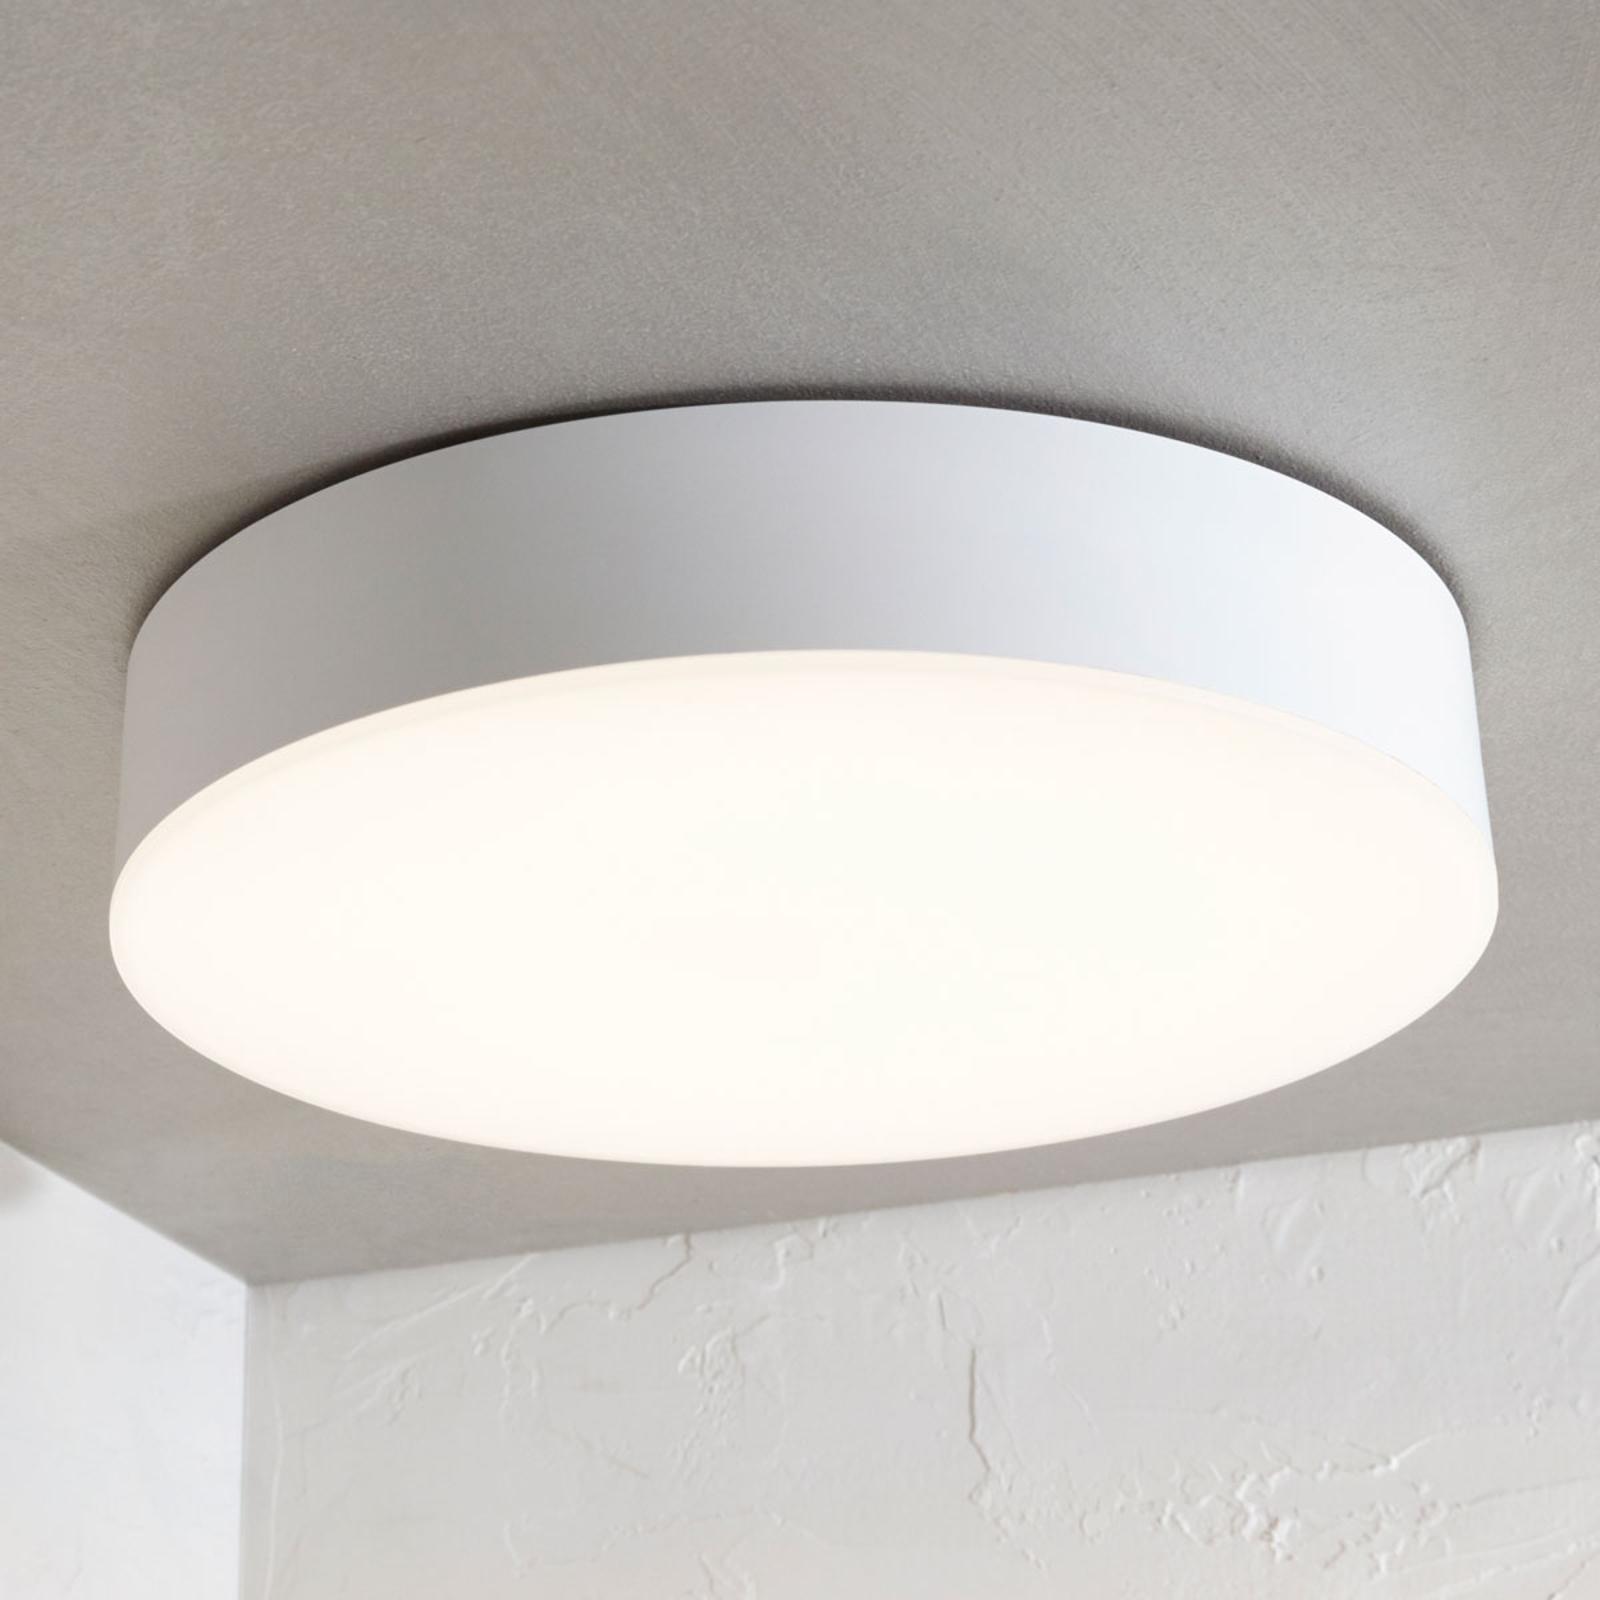 Lampa sufitowa LED Lyam, IP65, biała